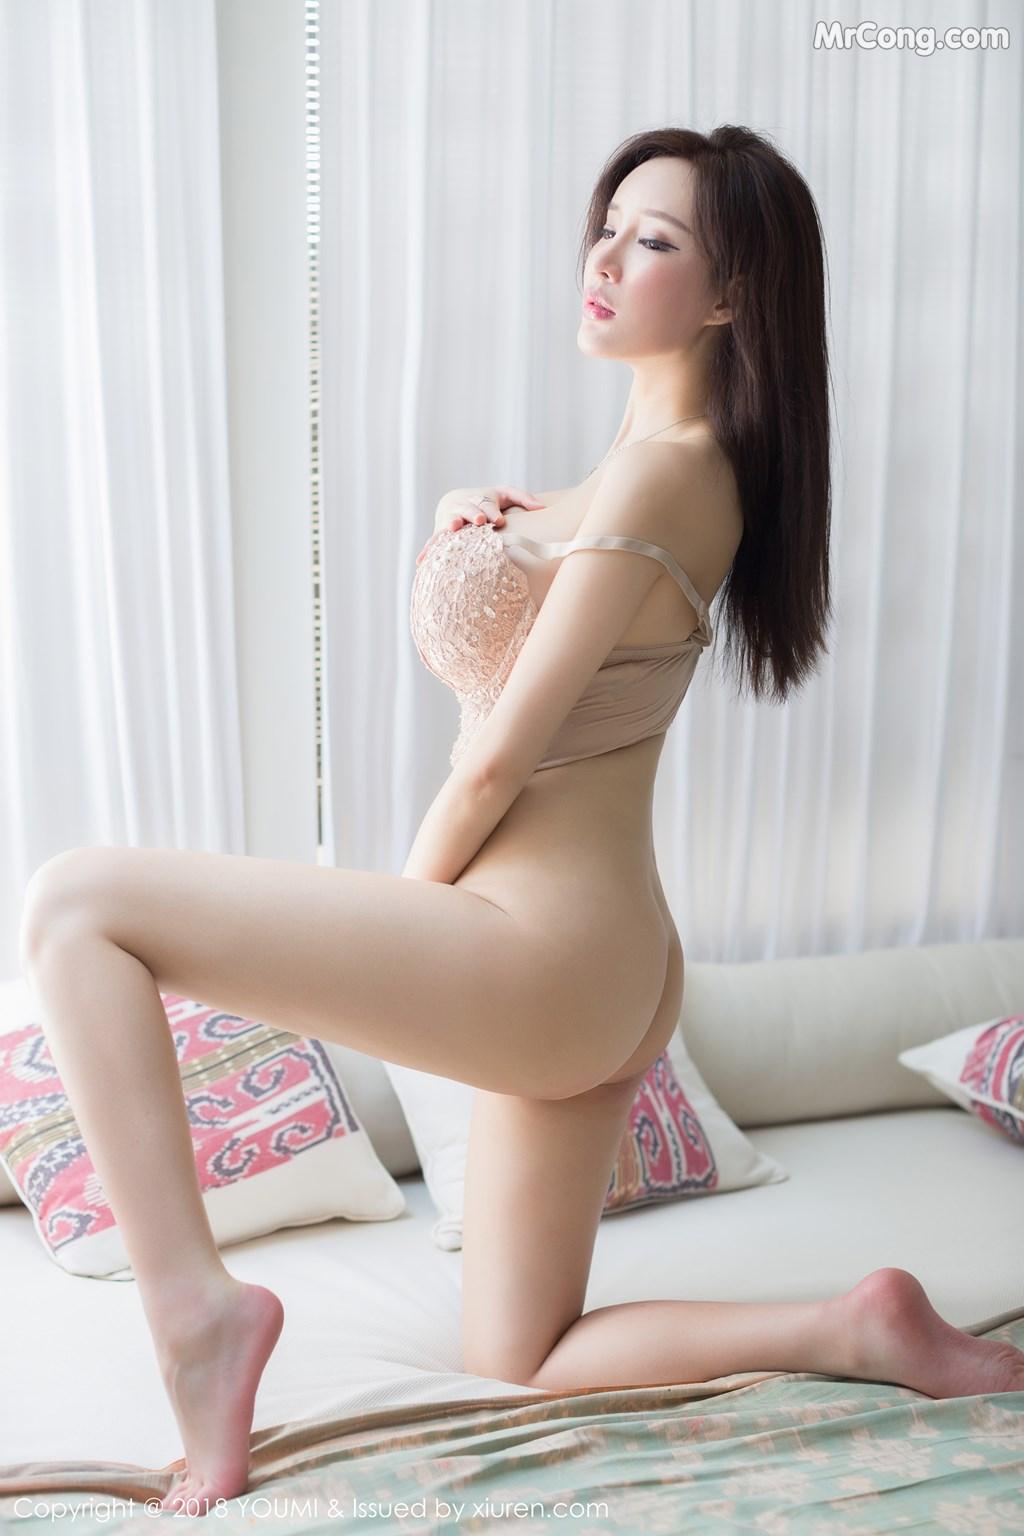 Image YouMi-Vol.197-Tu-Fei-Yuan-Ai-Cuo-Qiong-MrCong.com-006 in post YouMi Vol.197: Người mẫu 奶瓶土肥圆 (48 ảnh)